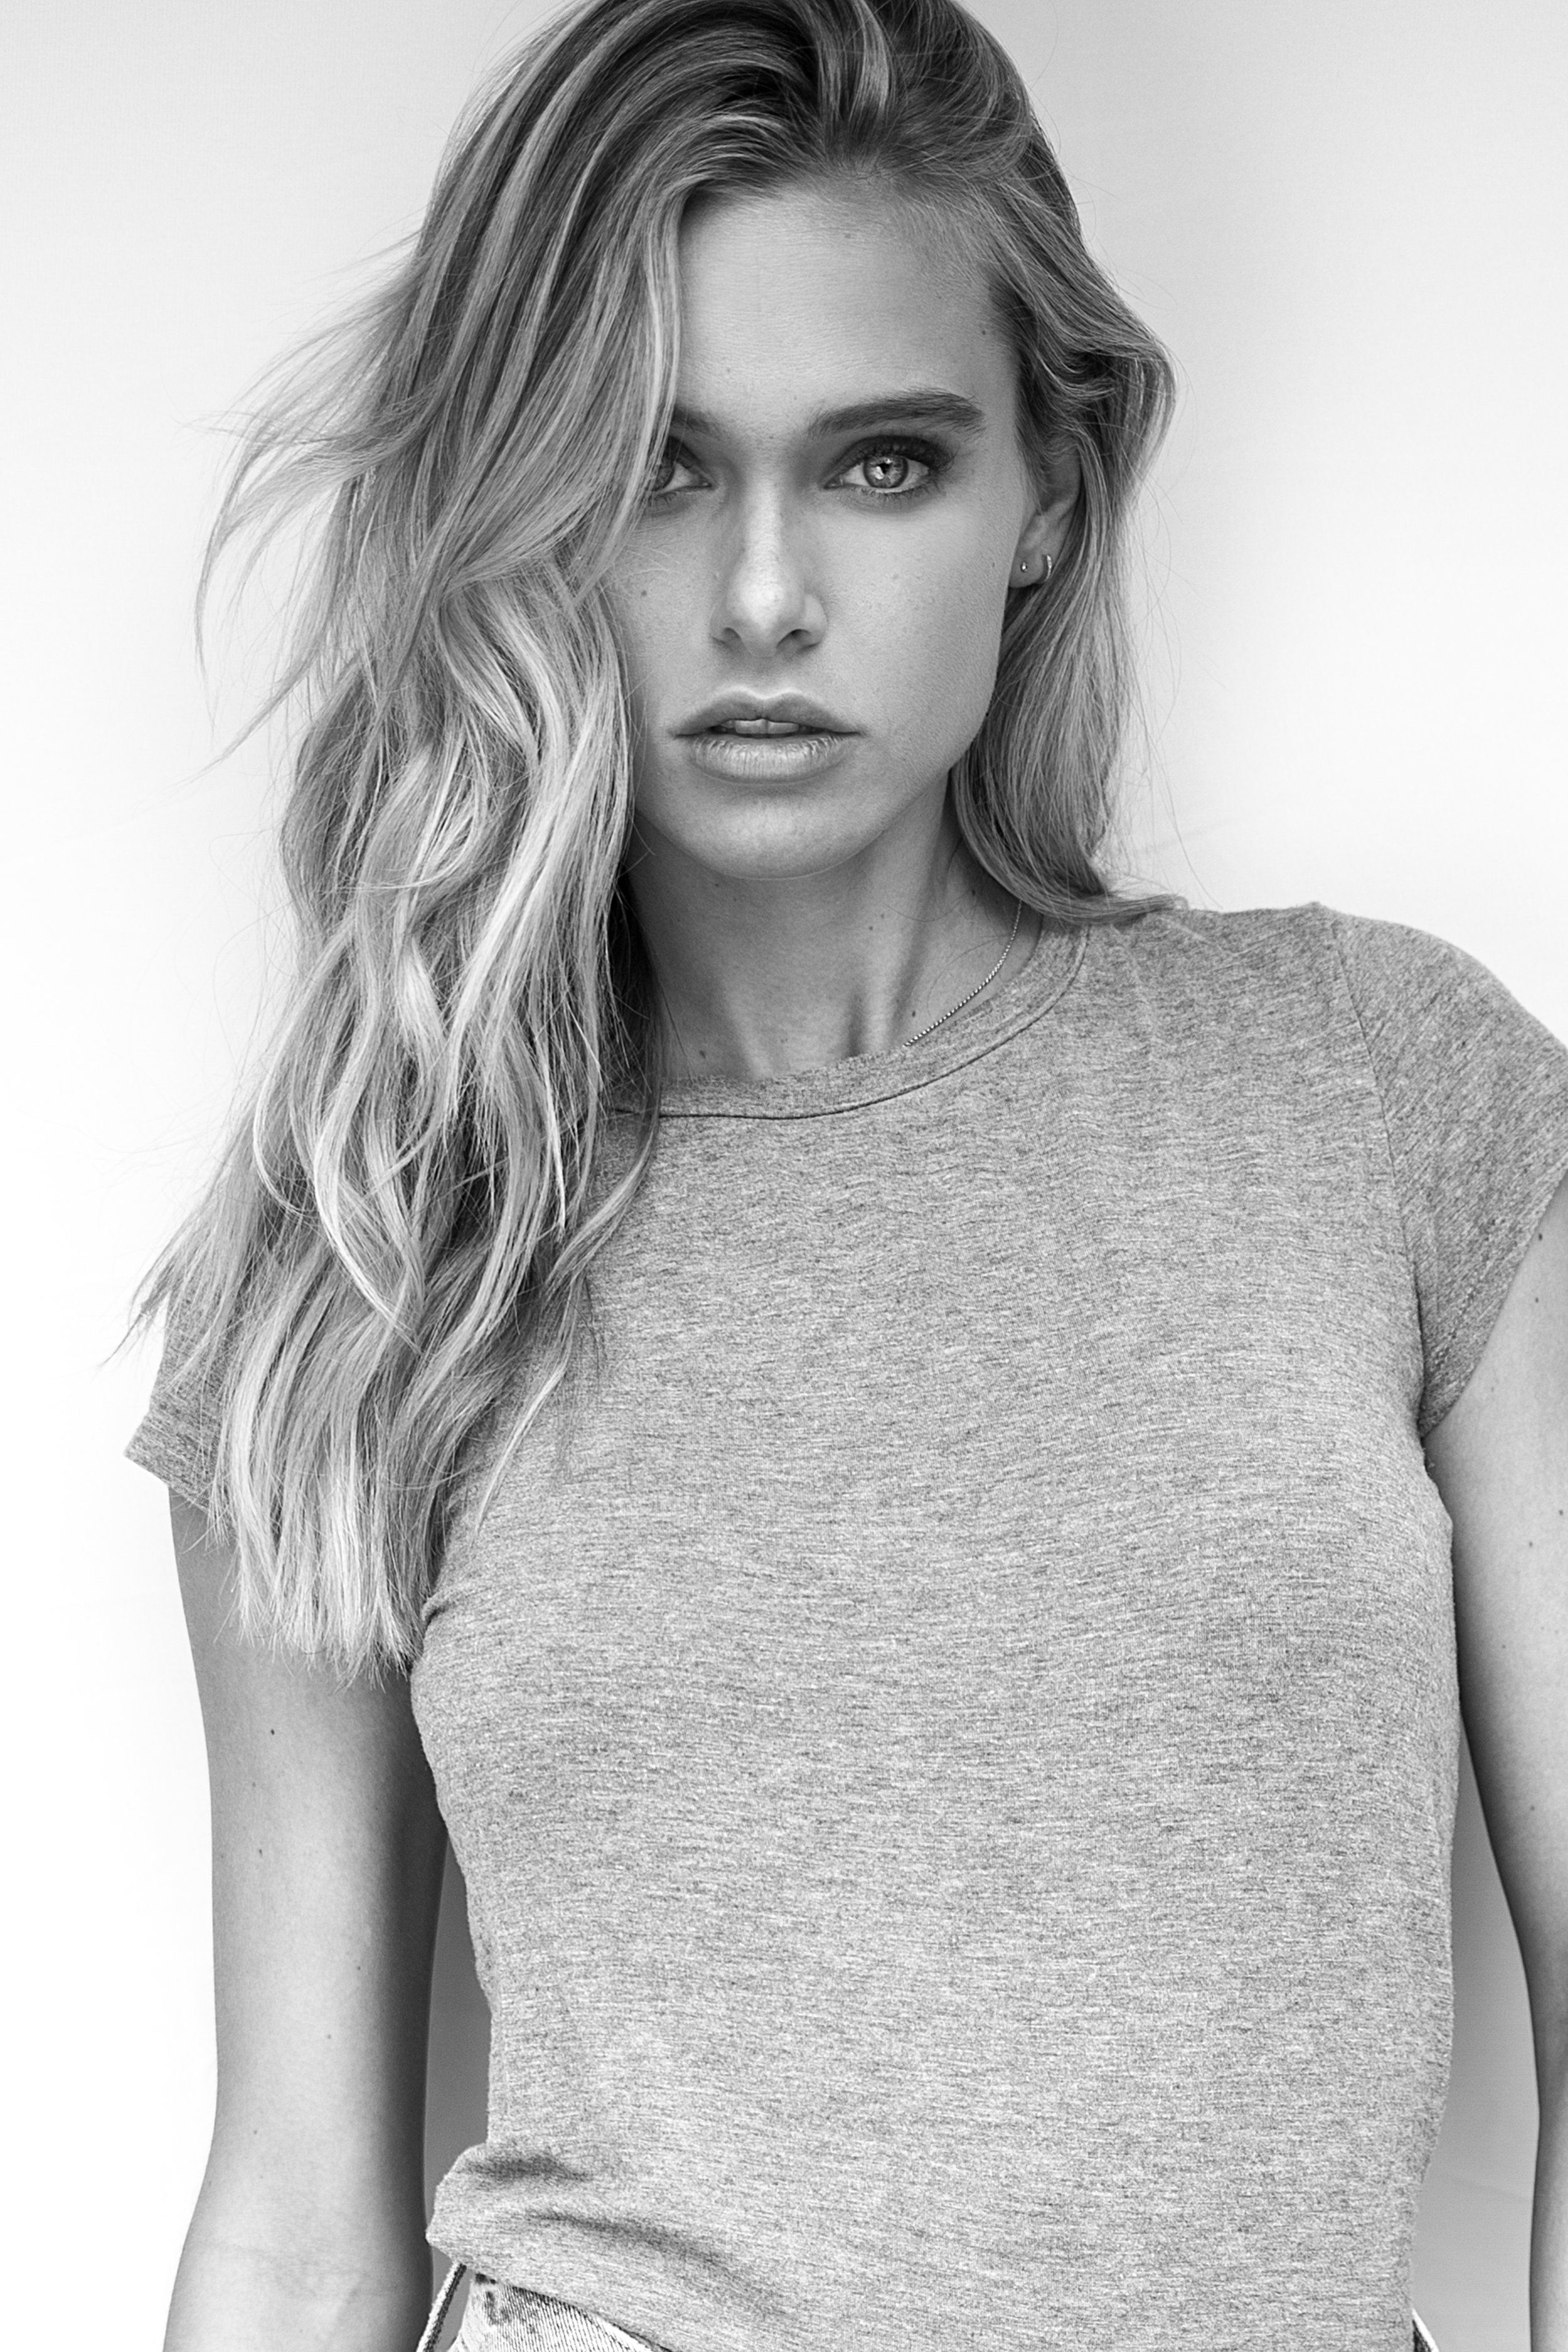 Model: Ellie Ottaway // The Block Agency